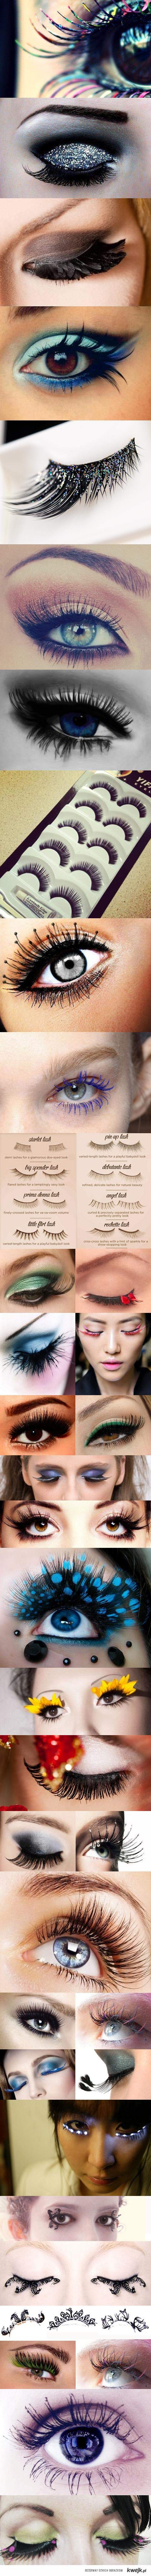 costume lashes & eye makeup